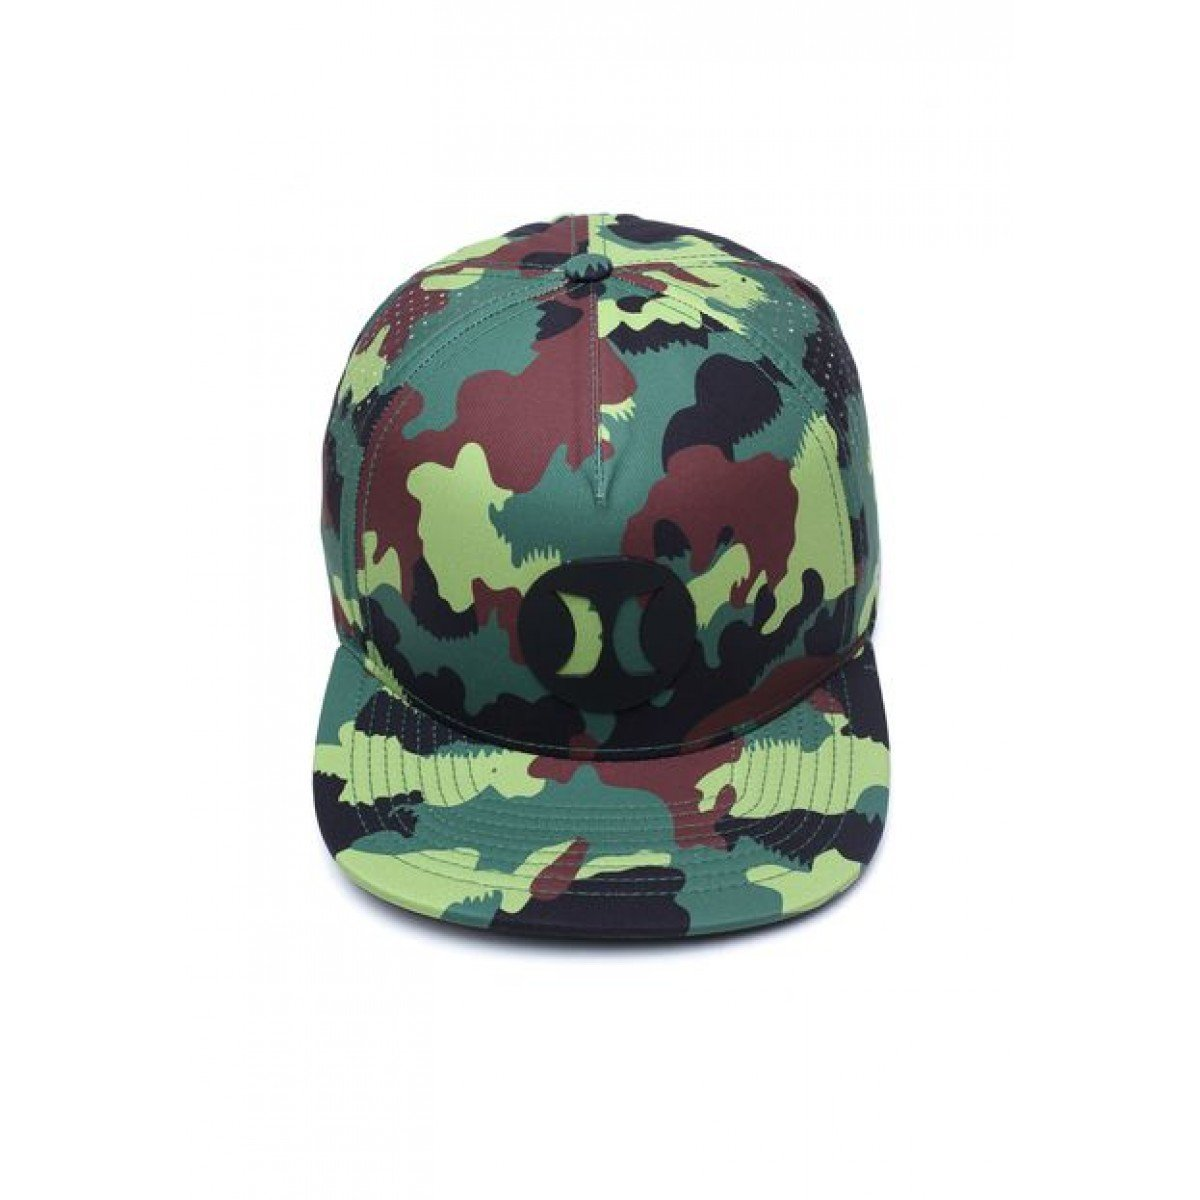 Boné Hurley Snapback Threat Verde Militar - Compre Agora  144fc3b0cd1